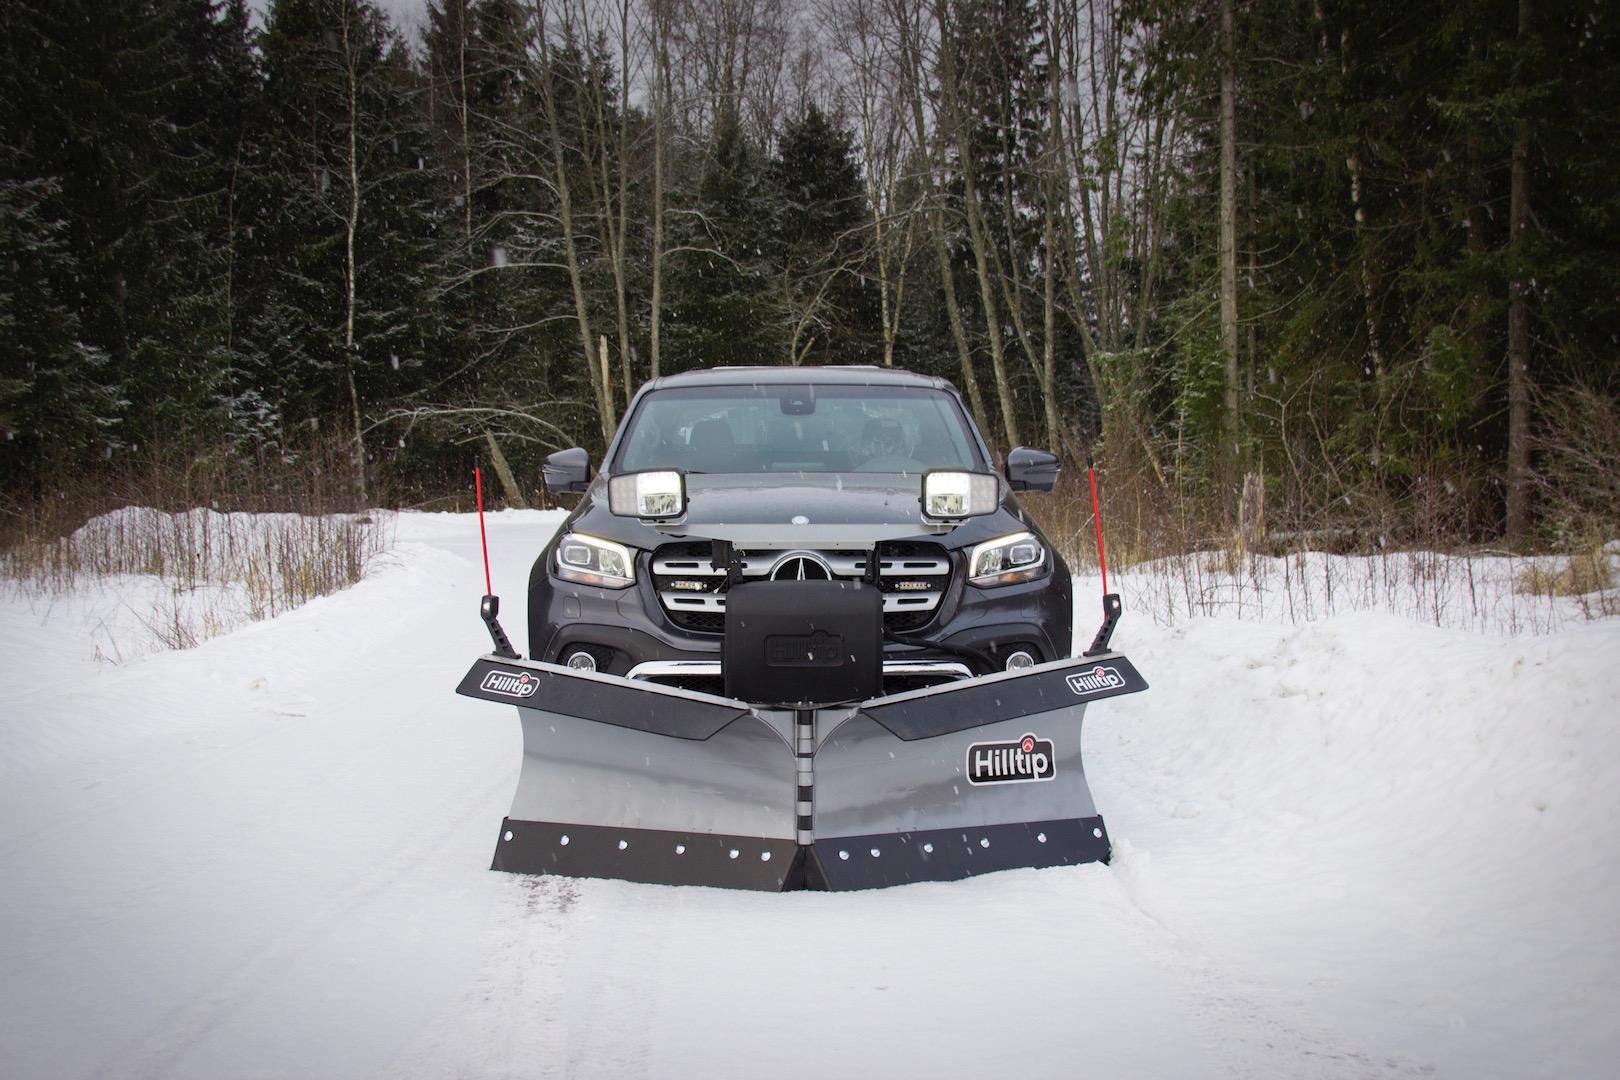 winterdienstfahrzeug-mercedes-x-klasse-vplow-2